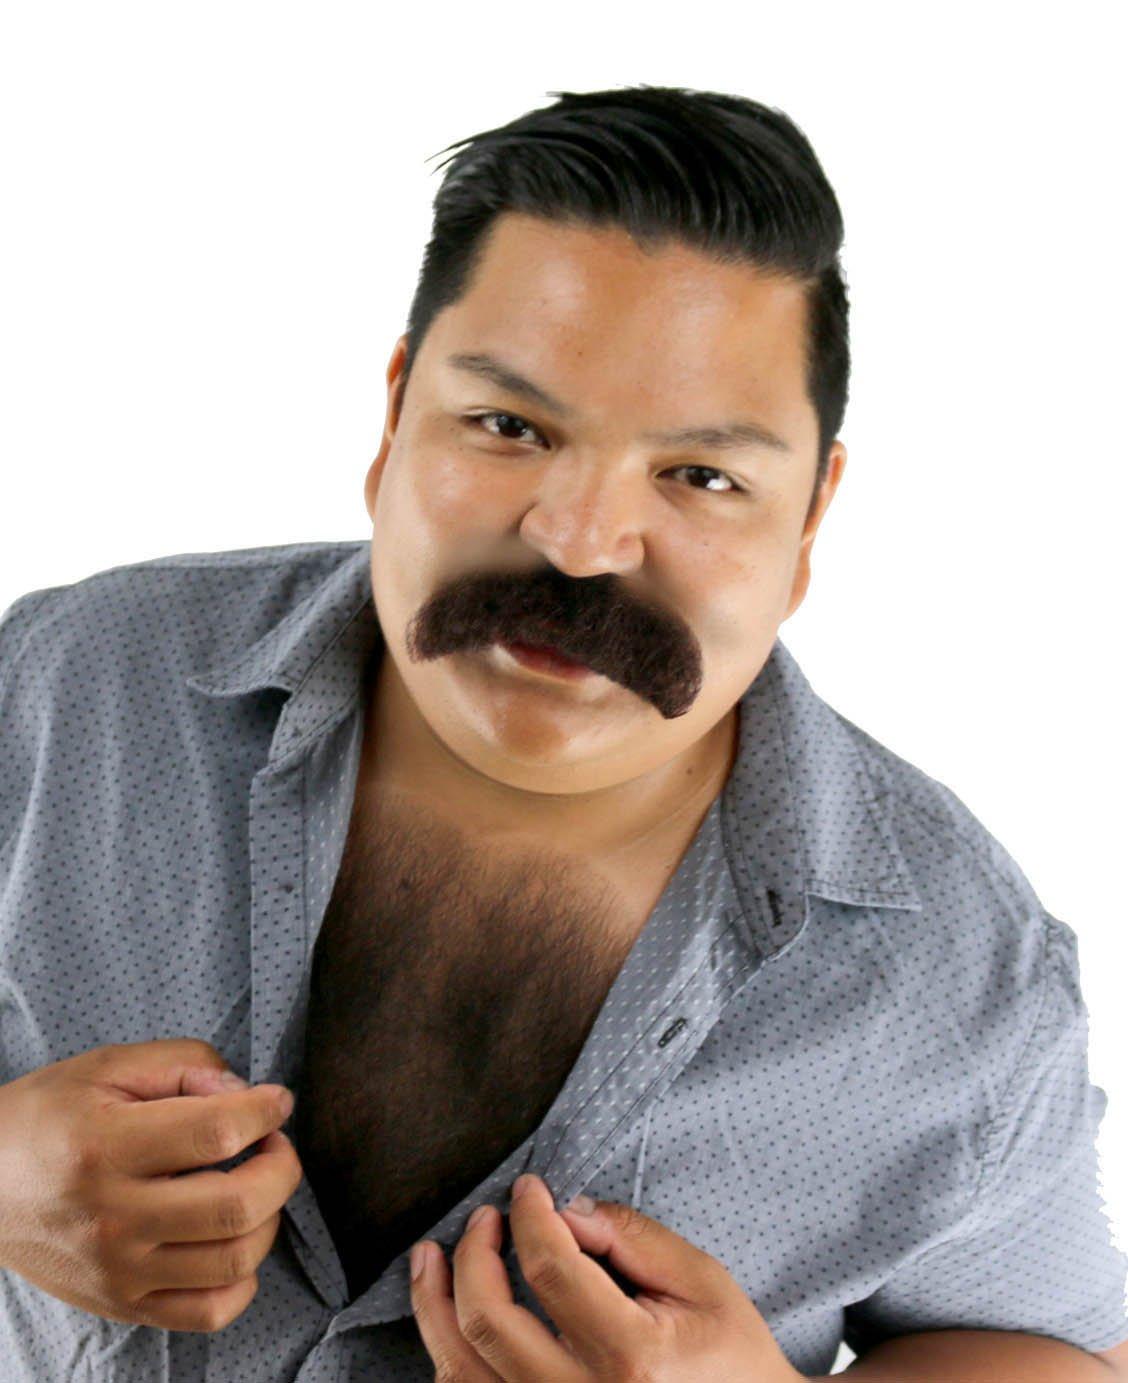 Brown Walrus Mustache